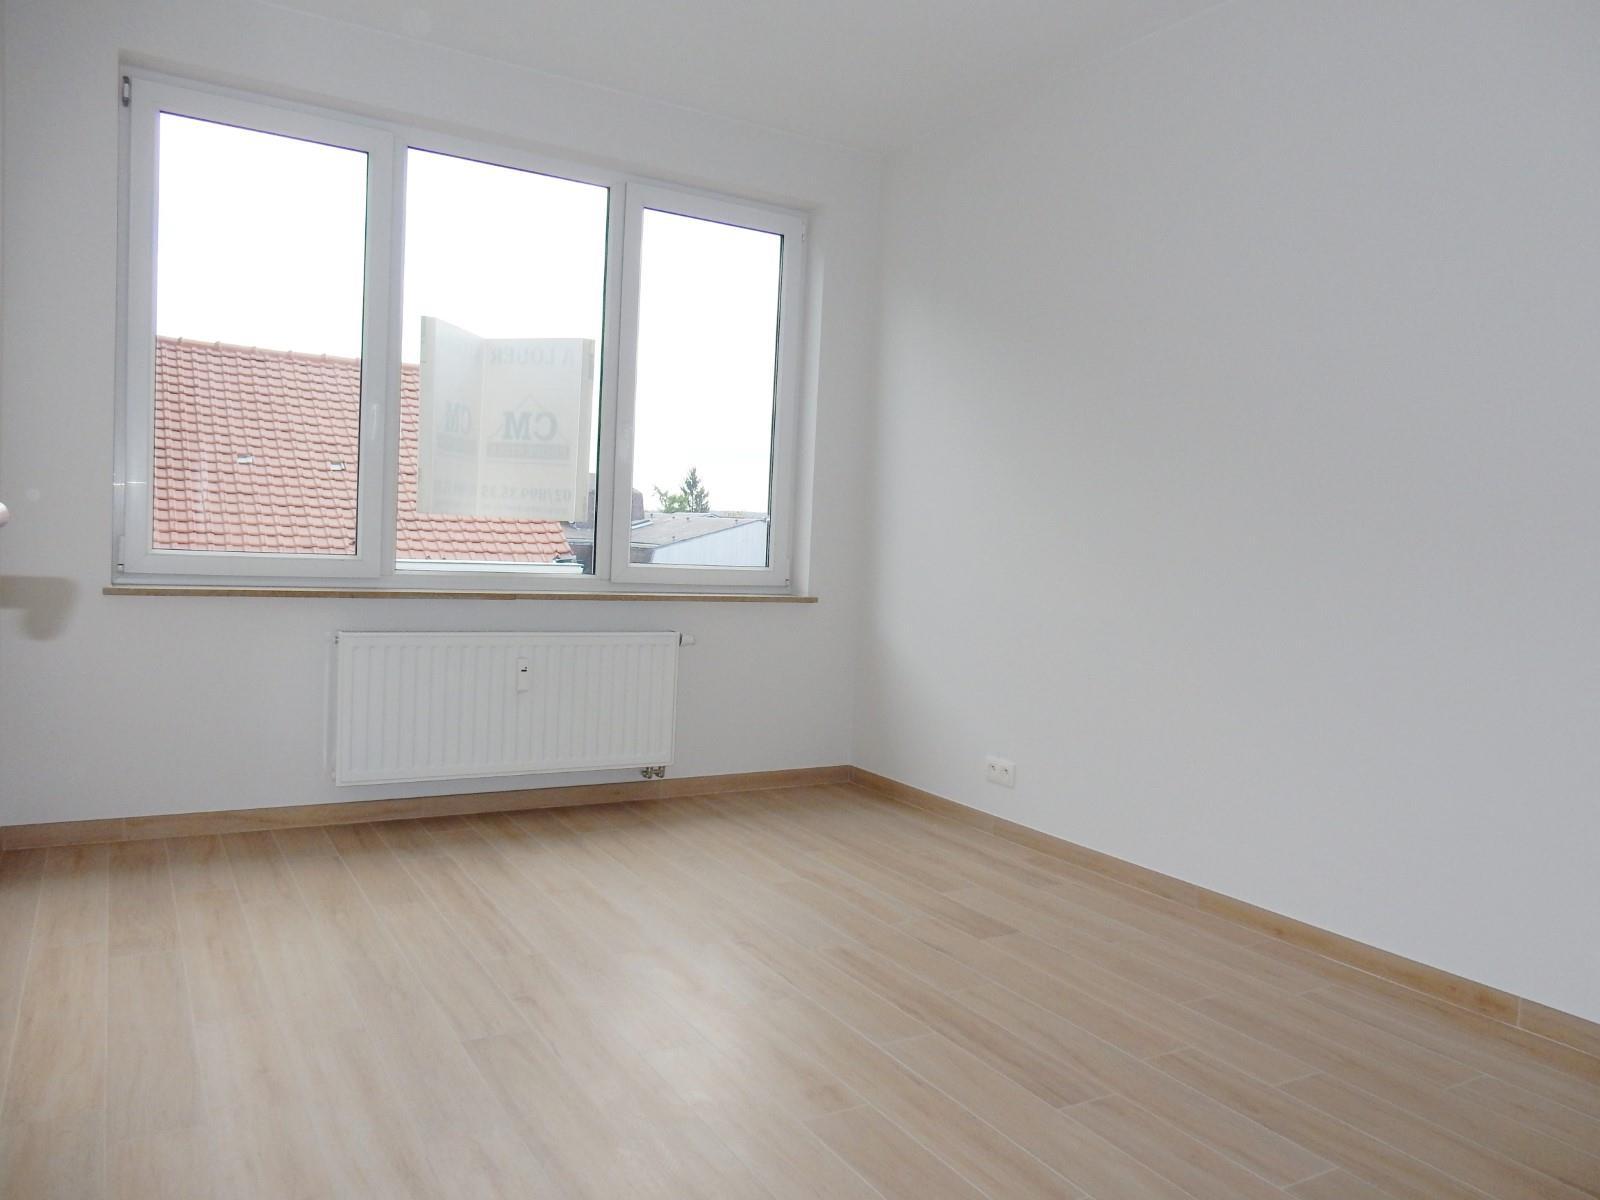 Appartement - Auderghem - #3071645-3